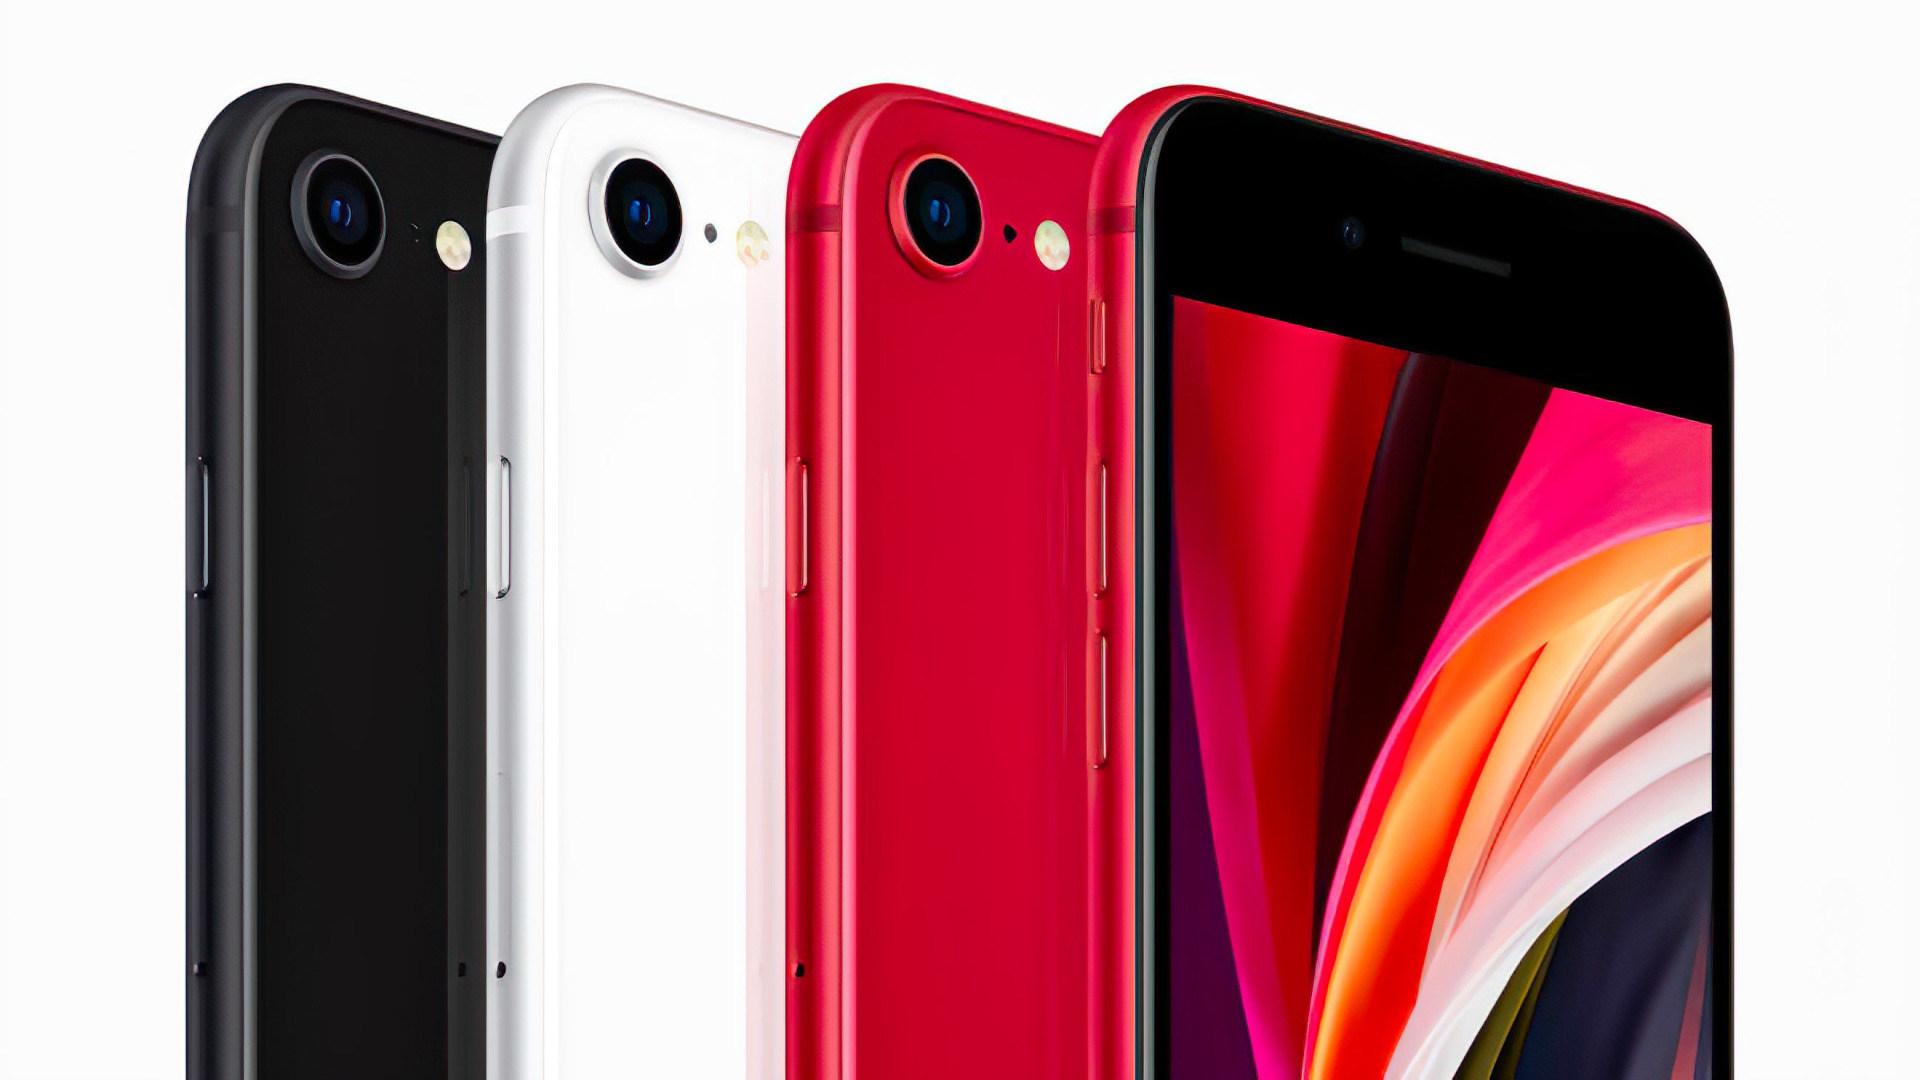 iPhone SE, Apple iPhone SE, iPhone SE2, iPhone SE 2020